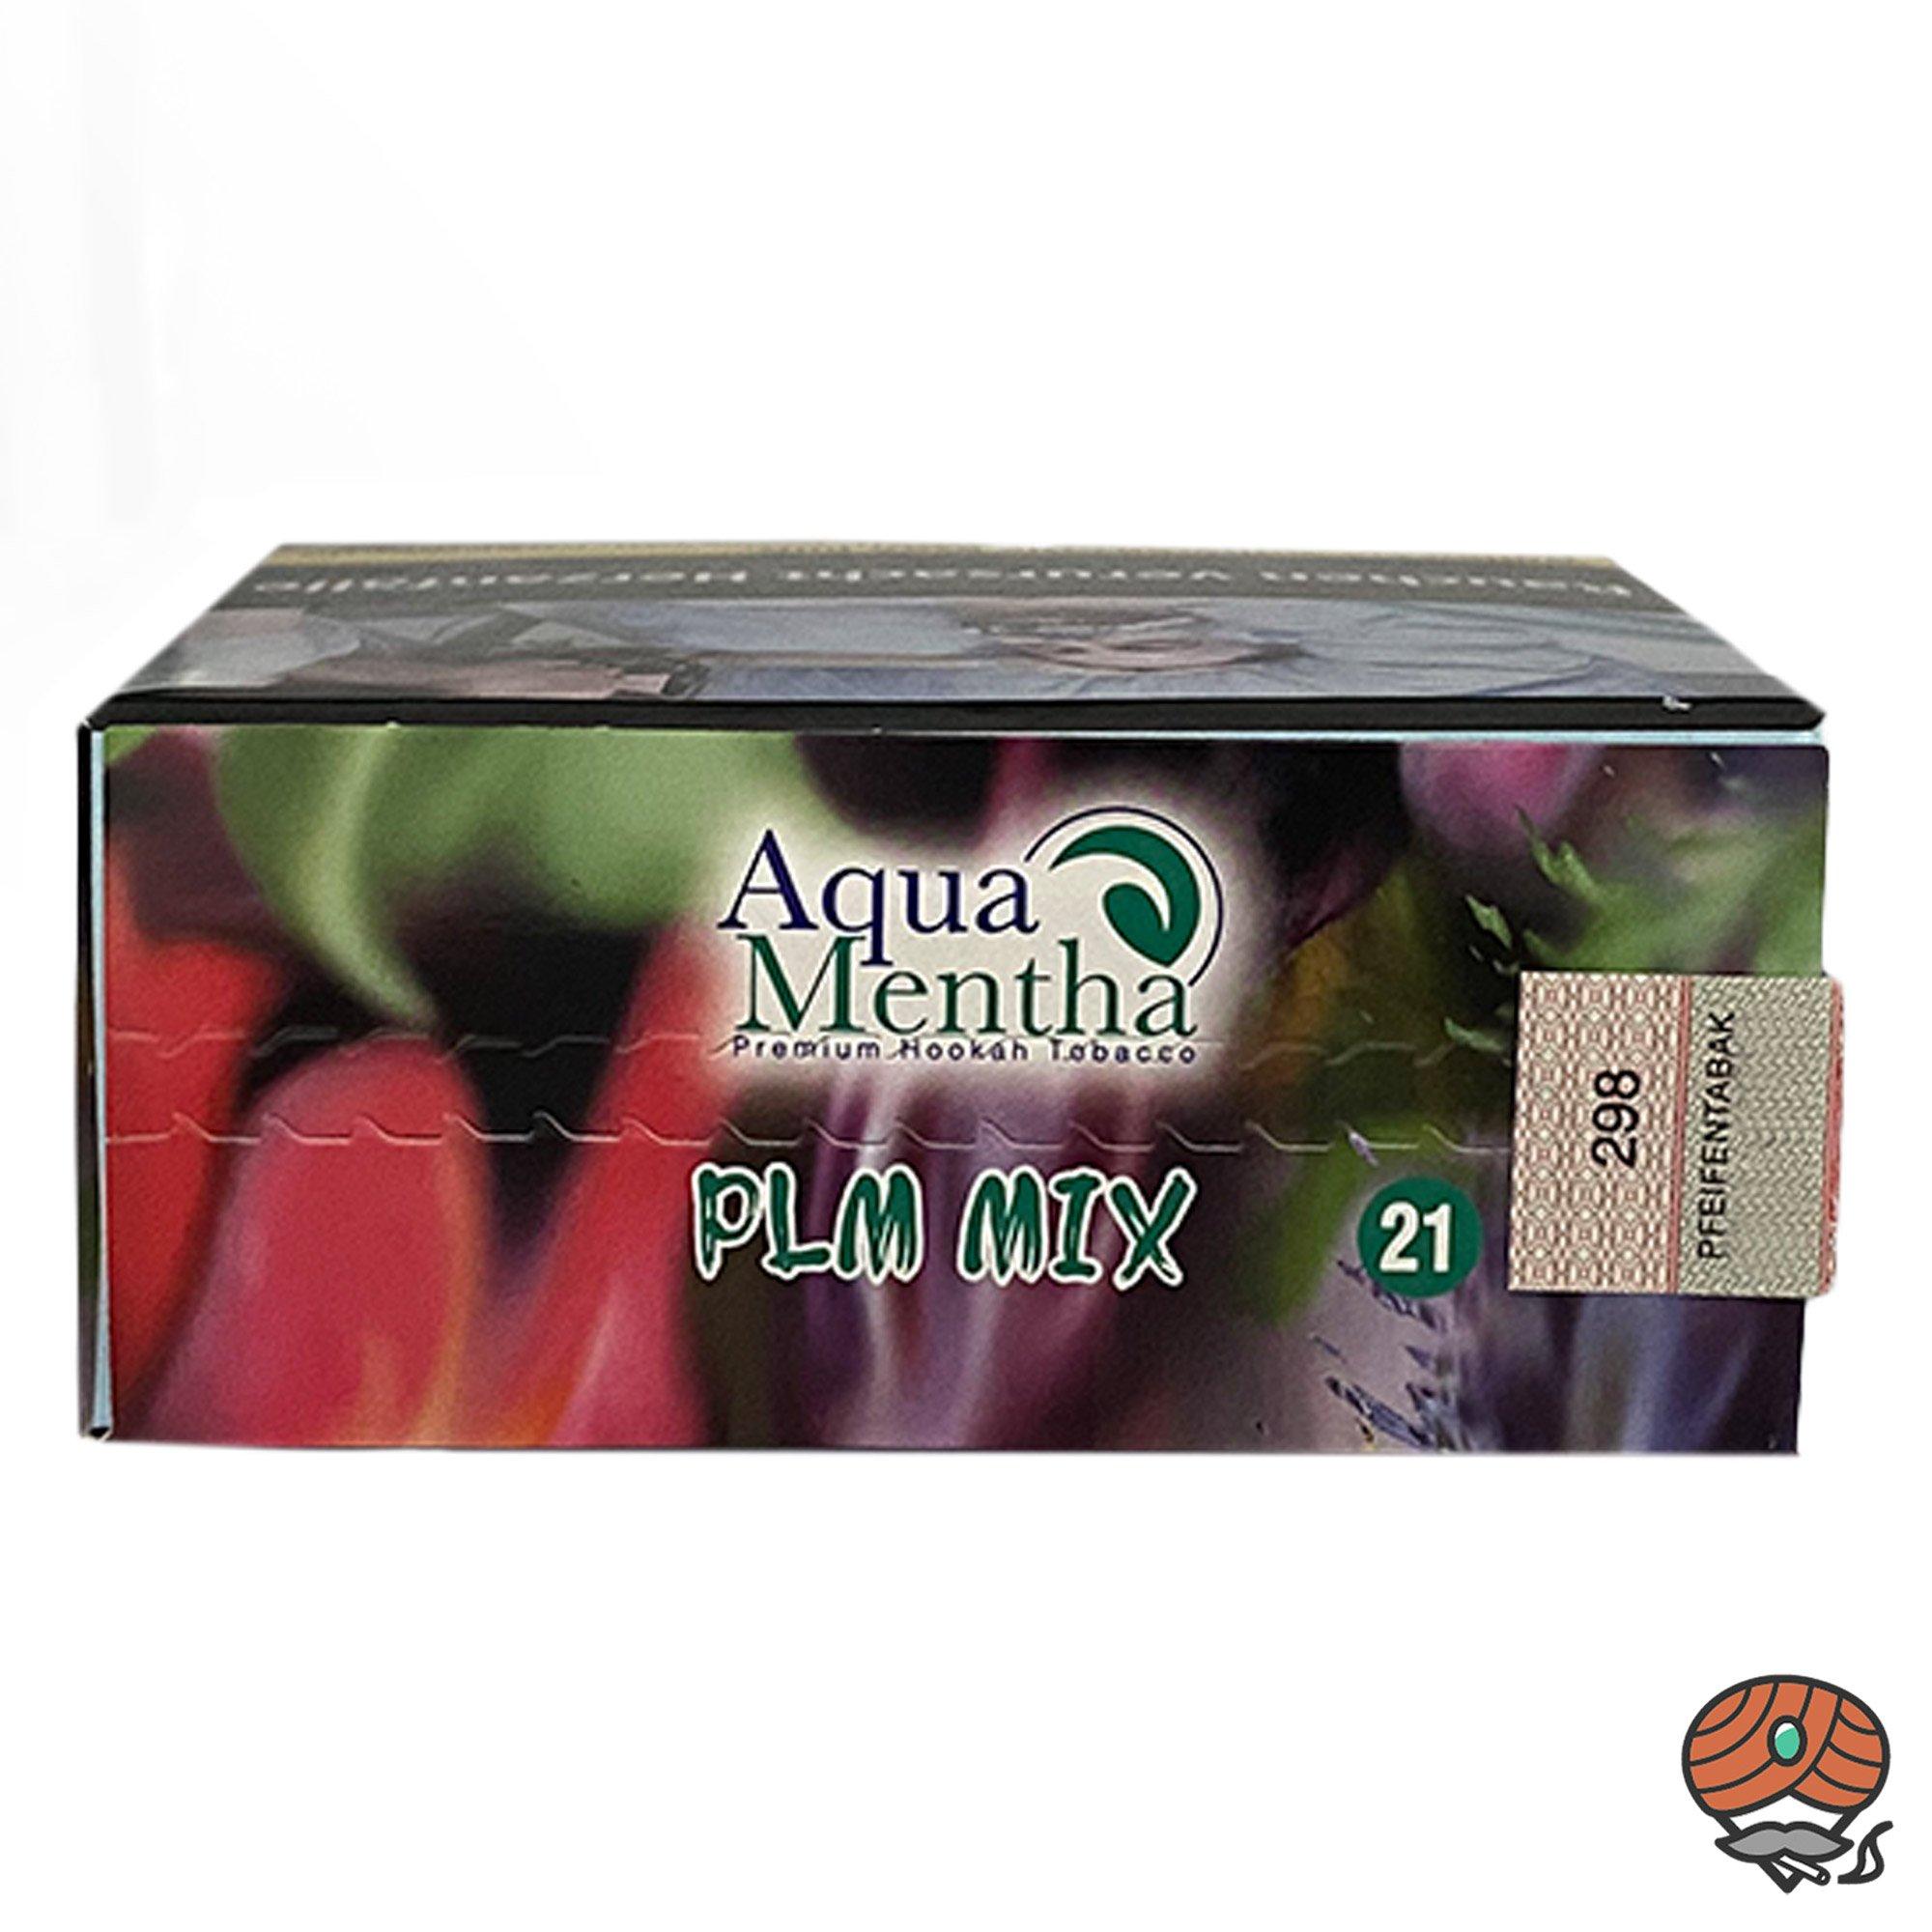 Aqua Mentha PLM Mix #21 200 g Shisha Tabak